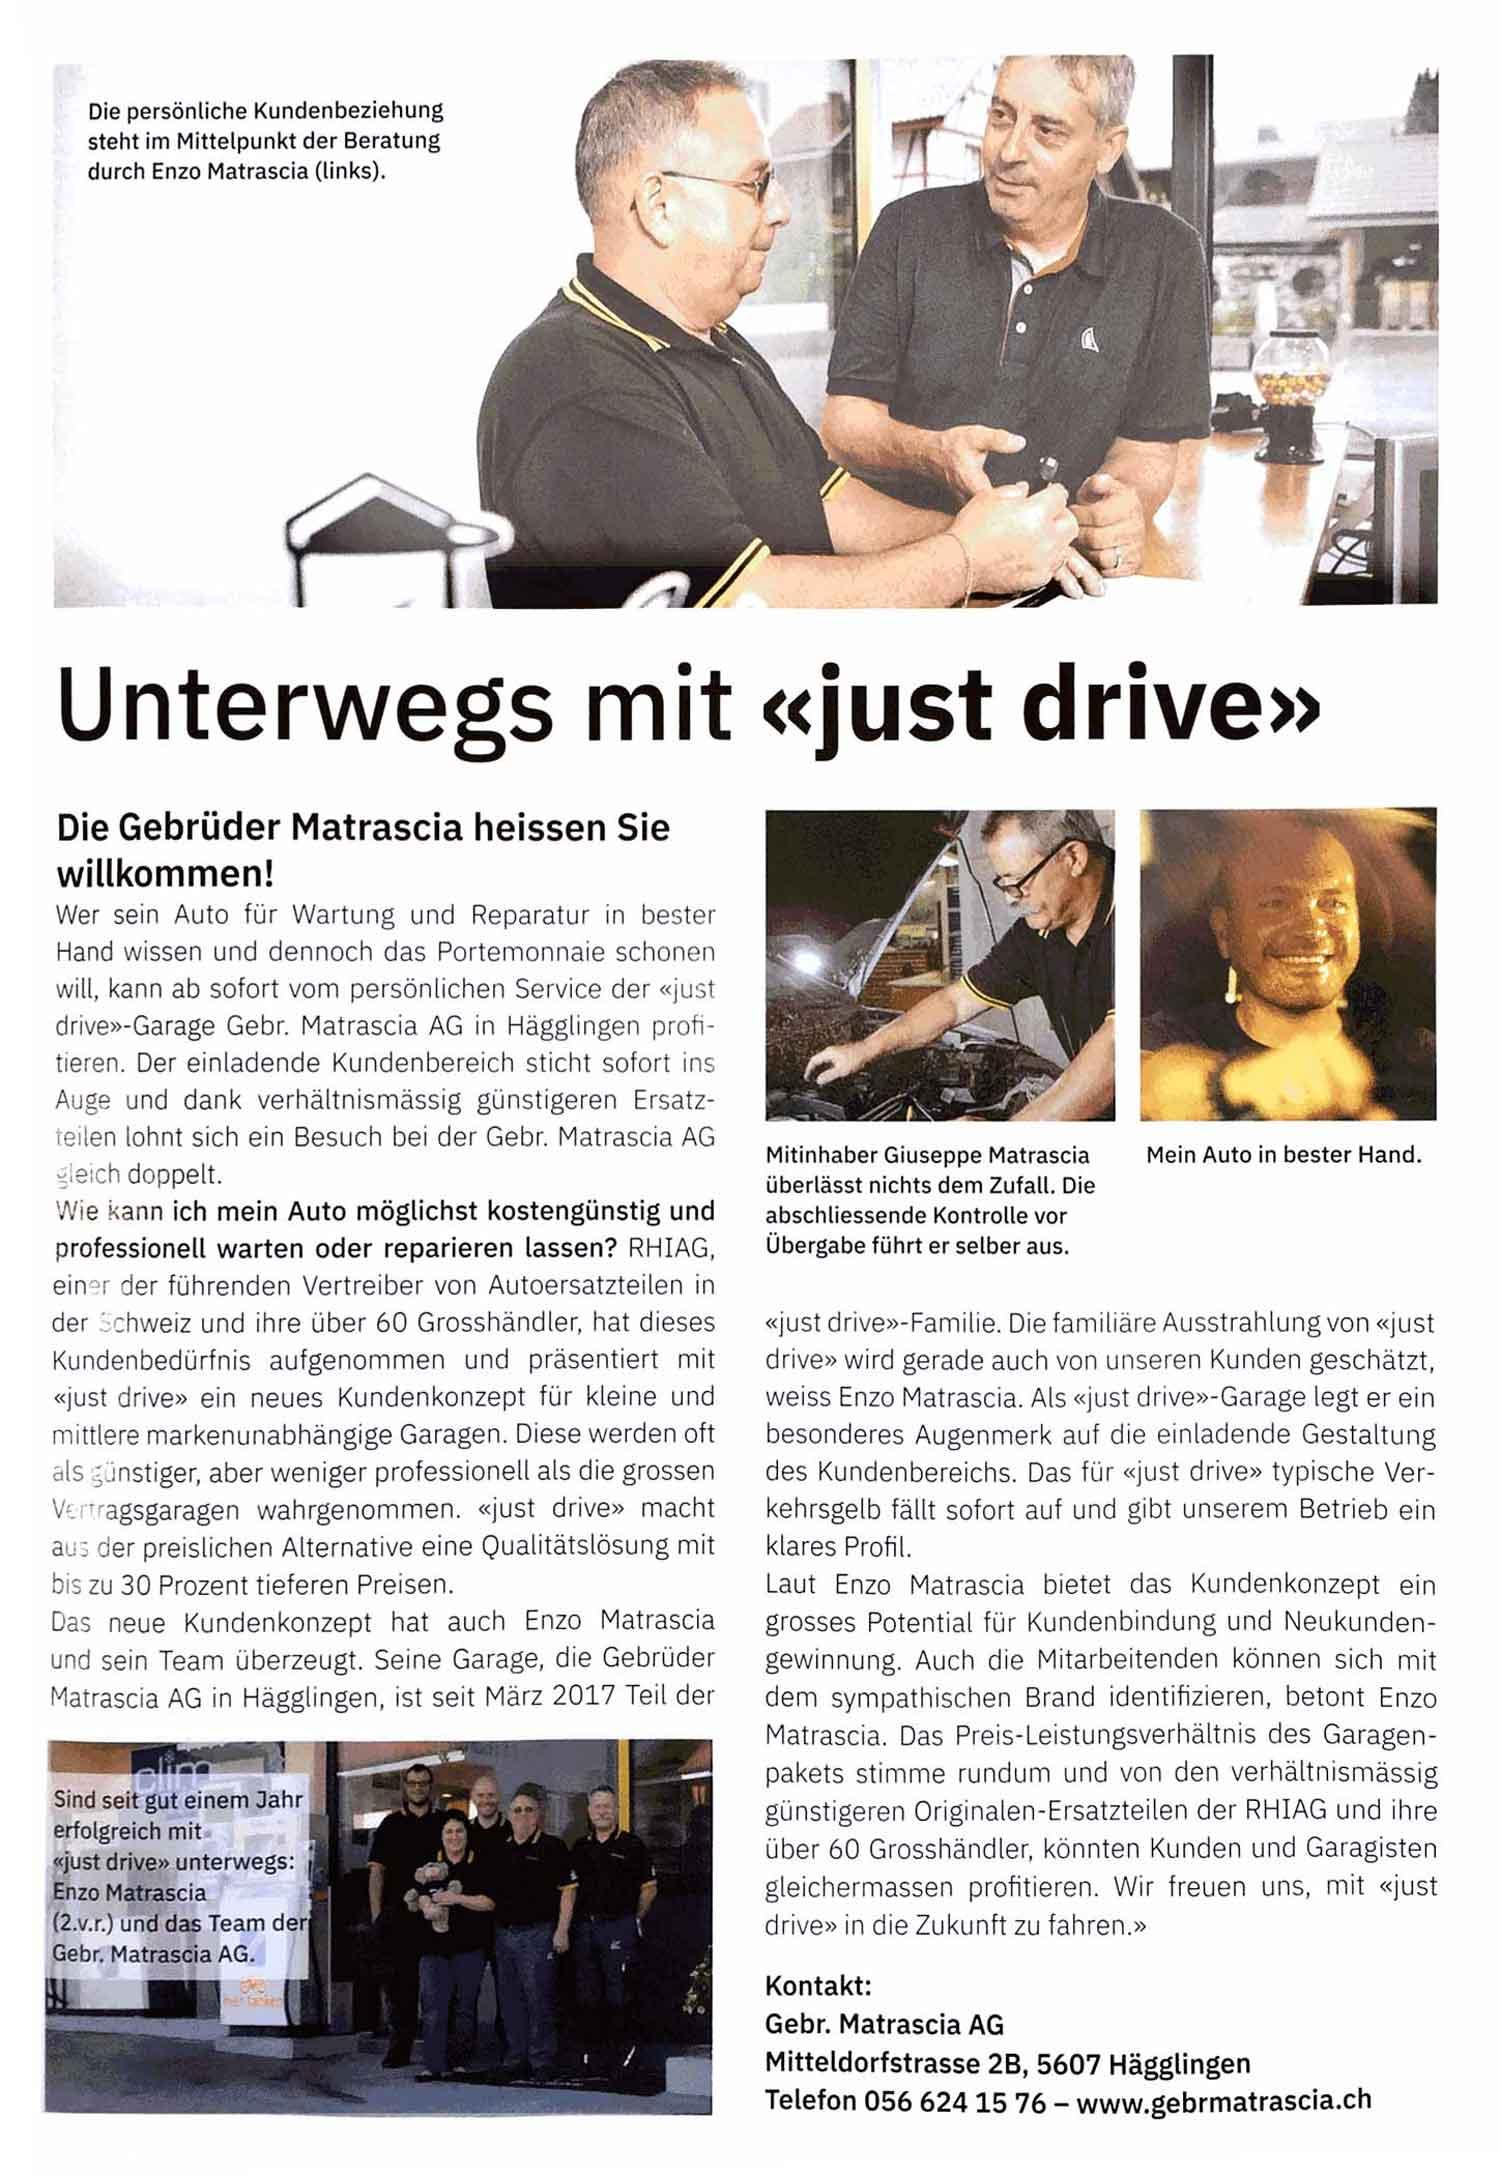 11_Auto-Illustrierte_05-2018_just_drive.jpg